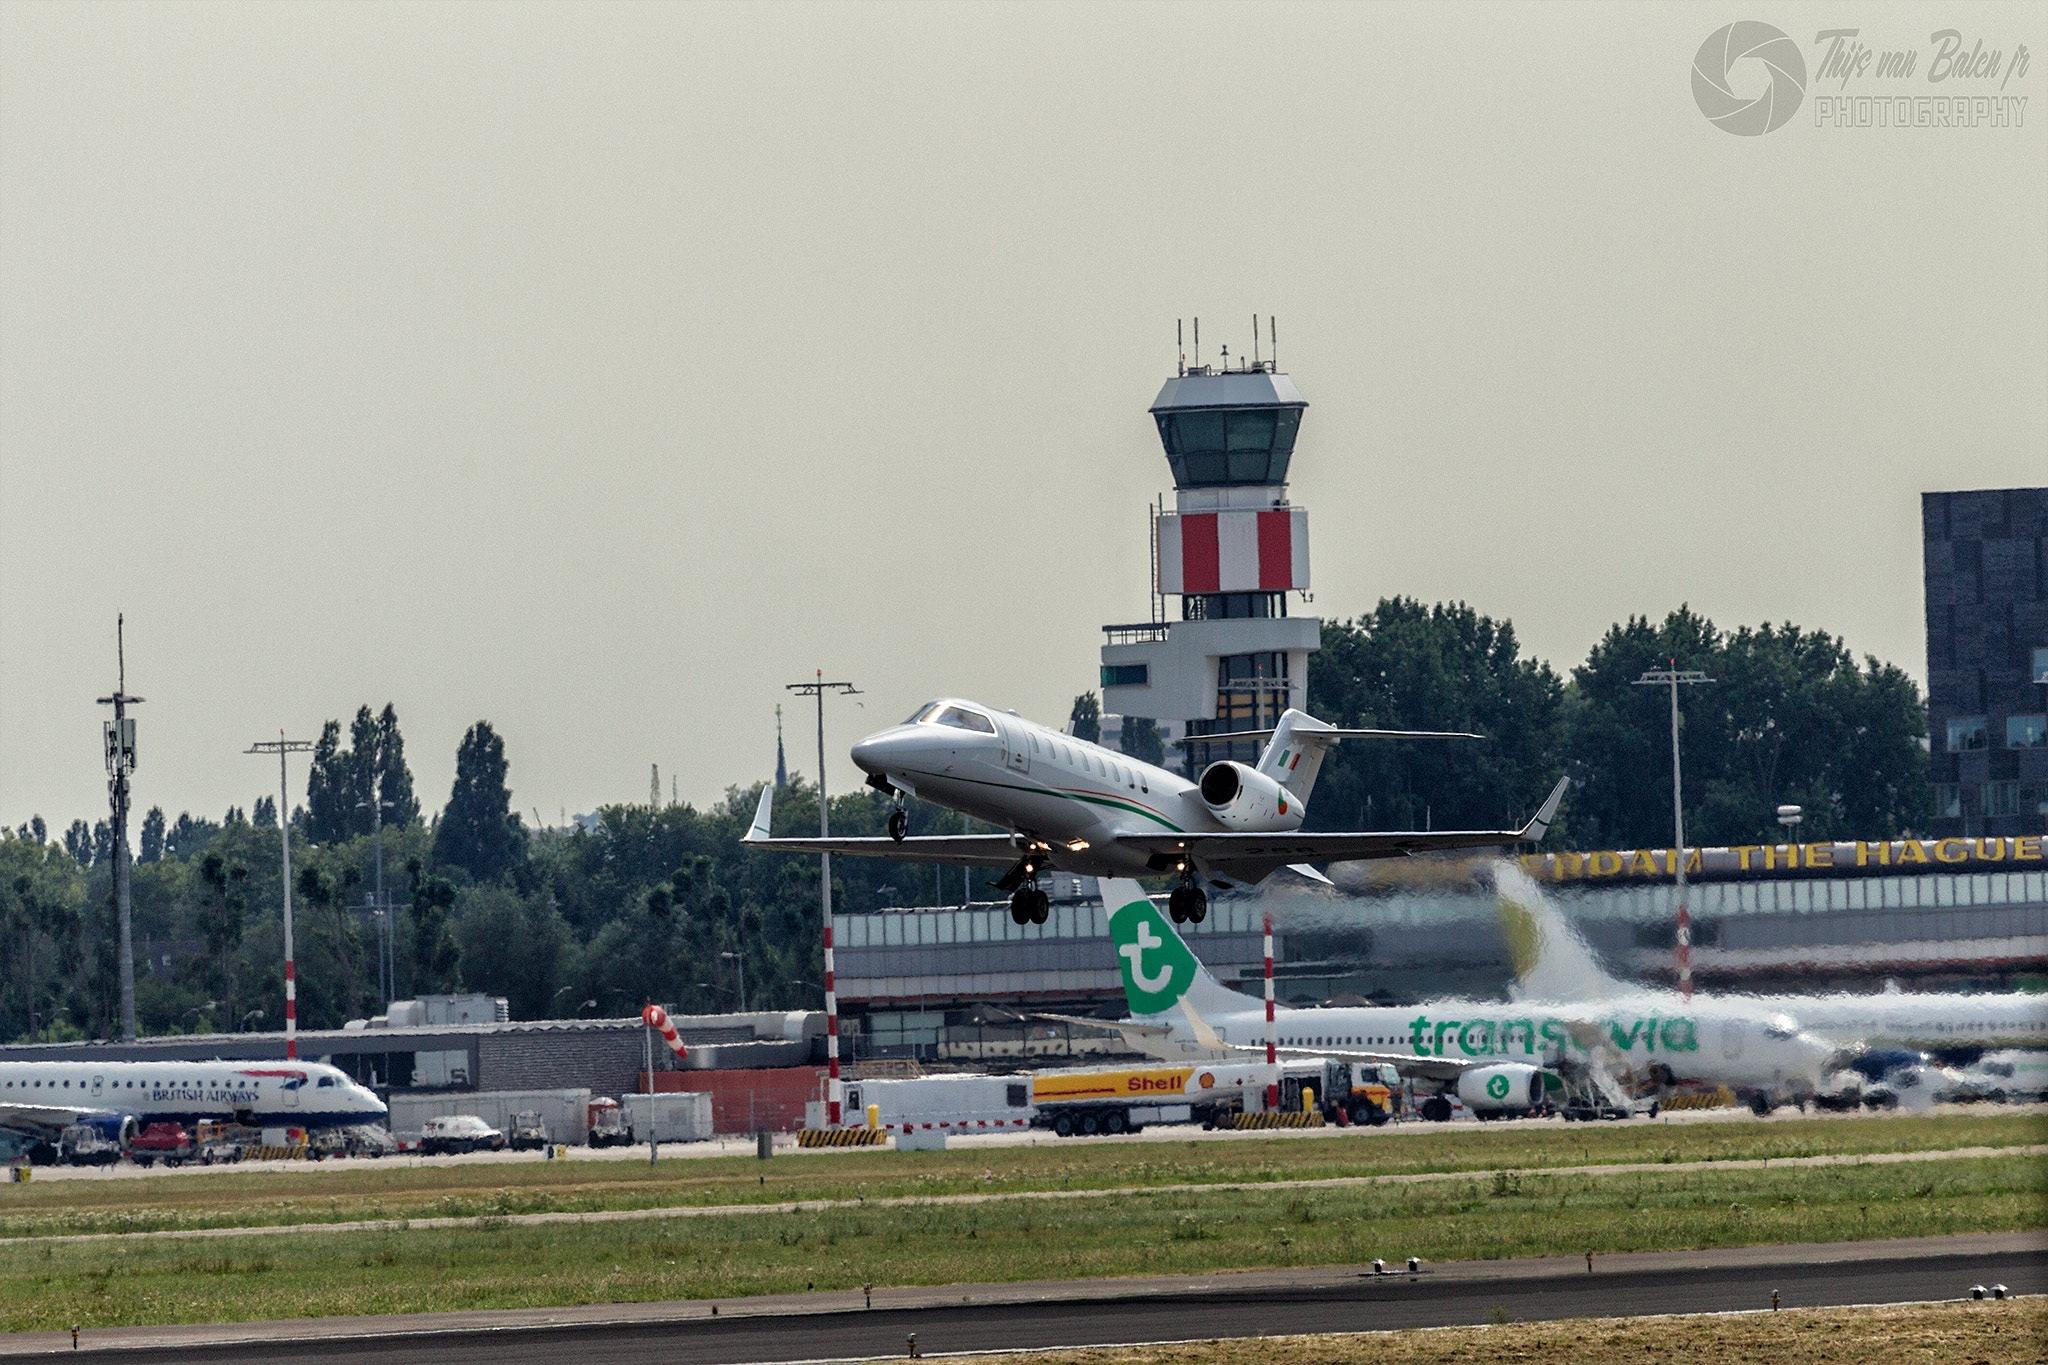 Rotterdam The Hague airport 3 by Thijs van Balen Jr